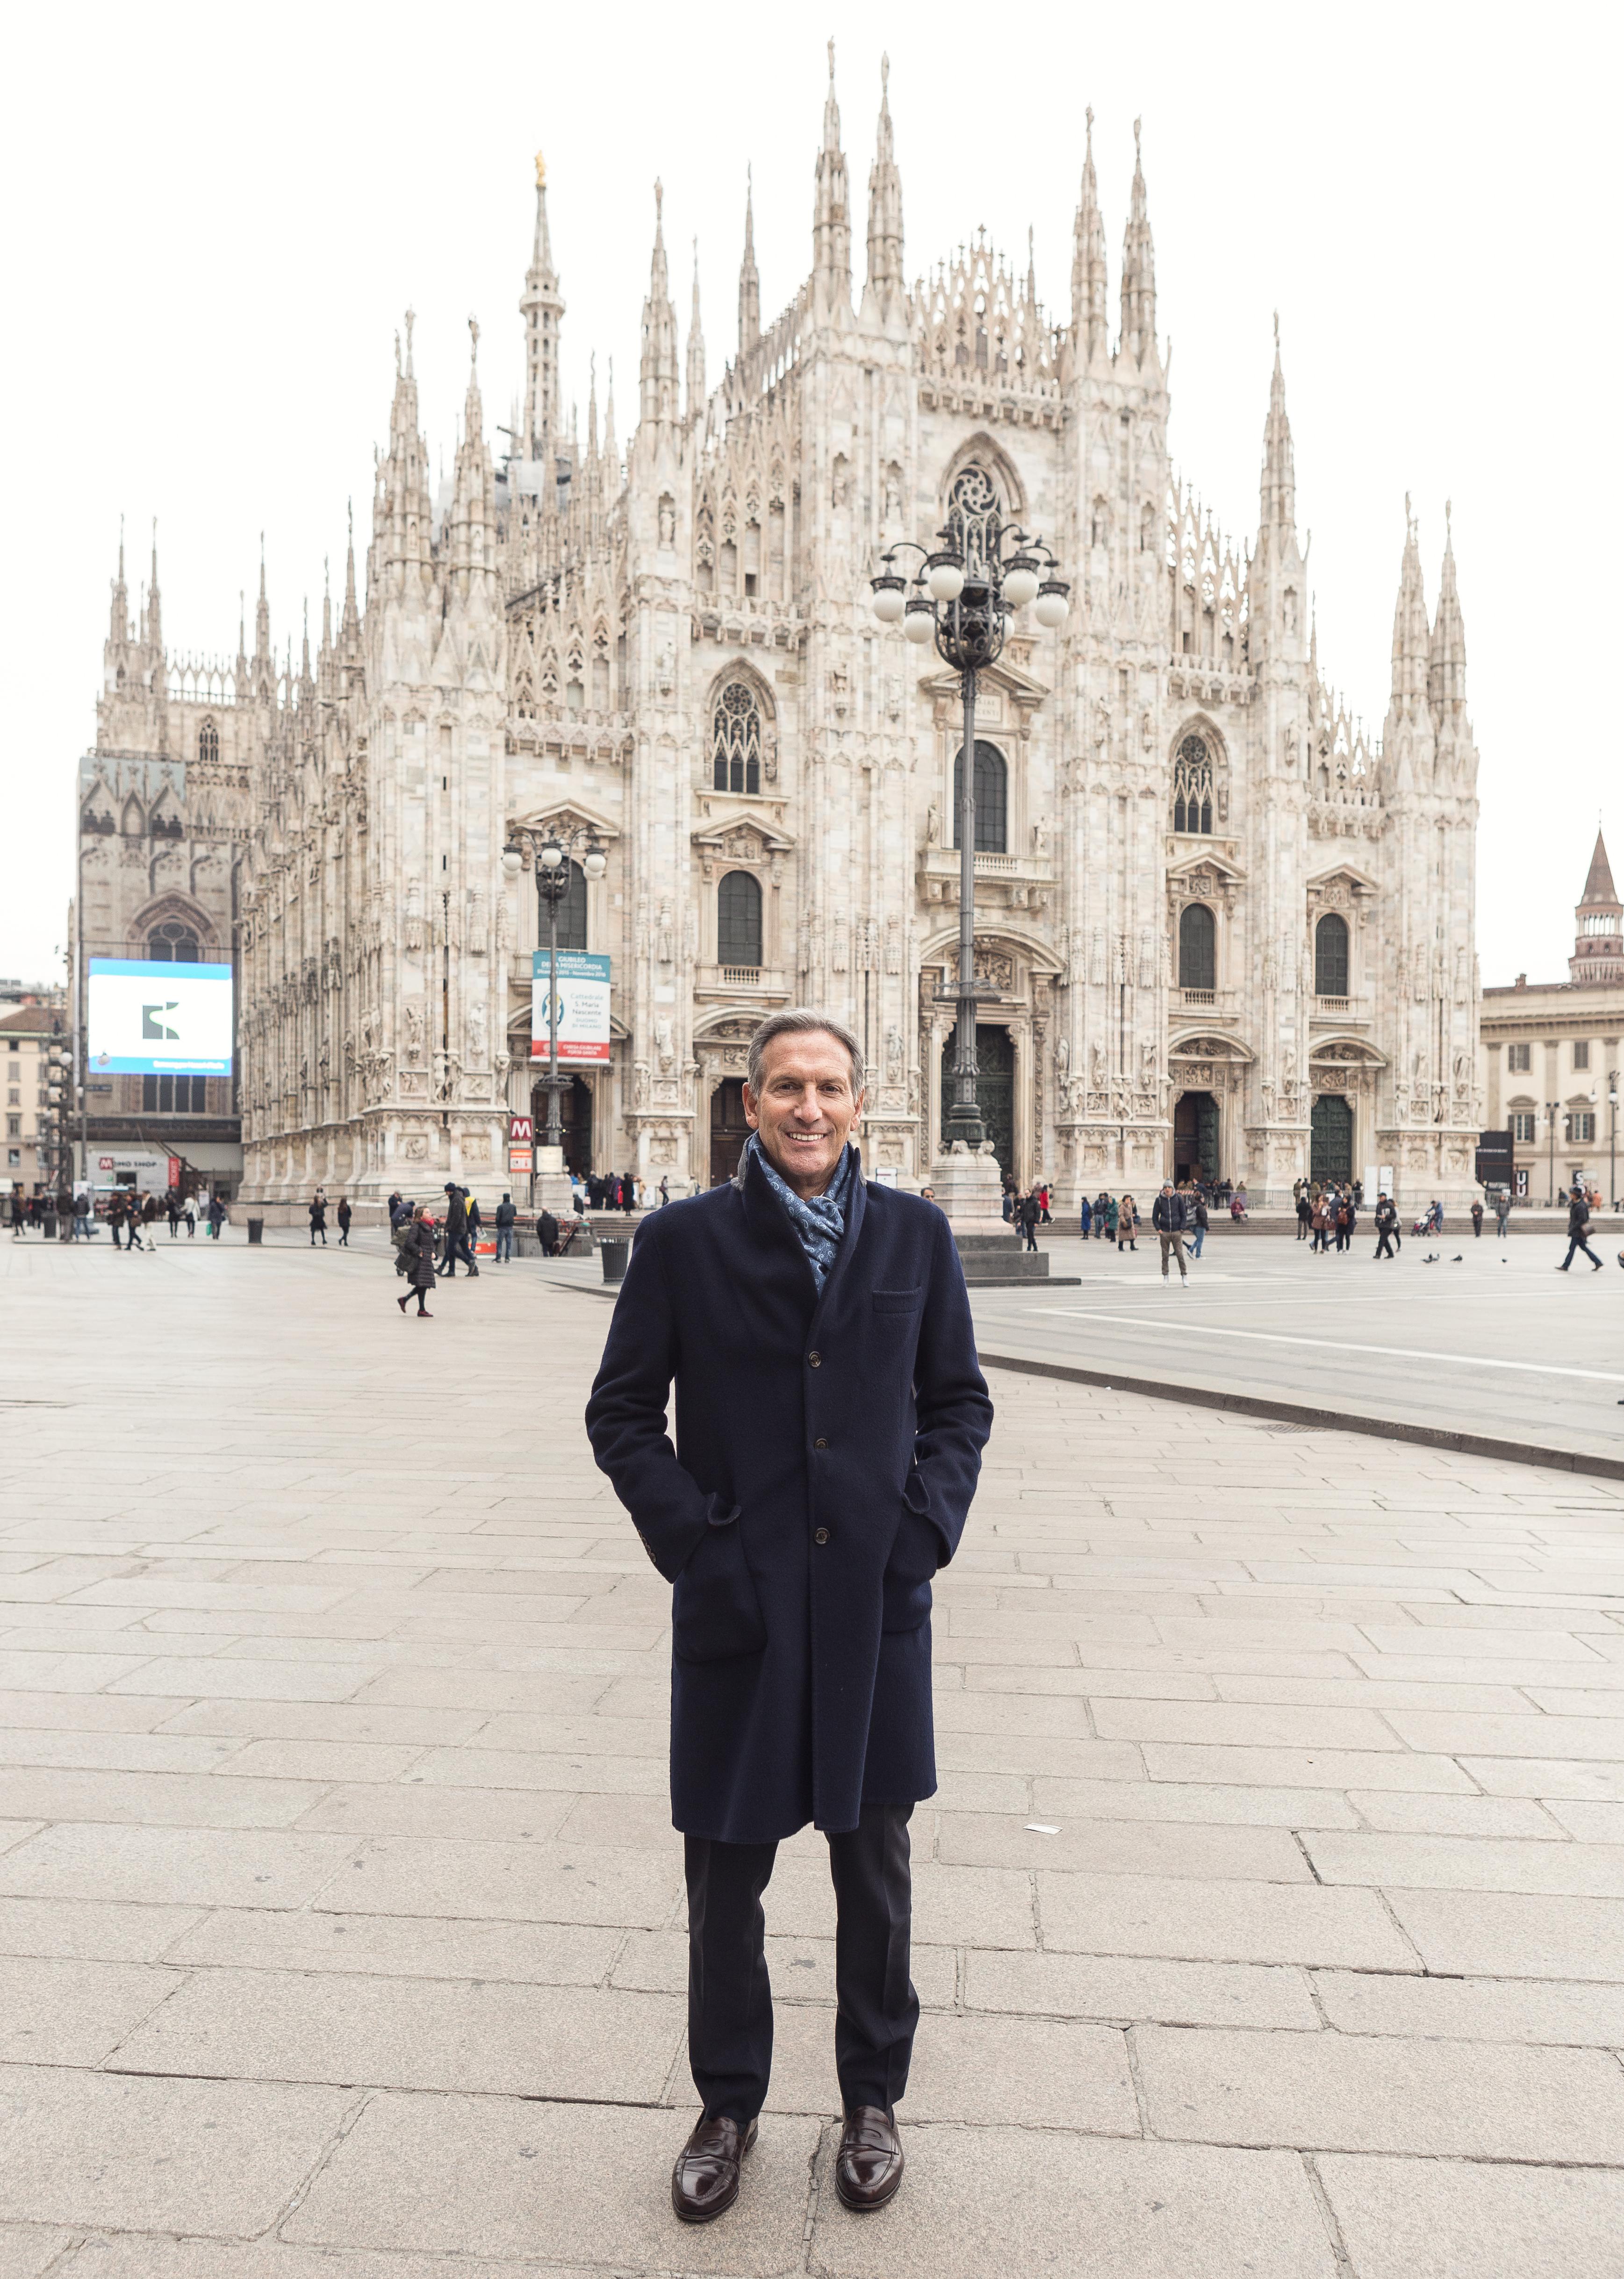 Howard_in_Italy_(7)